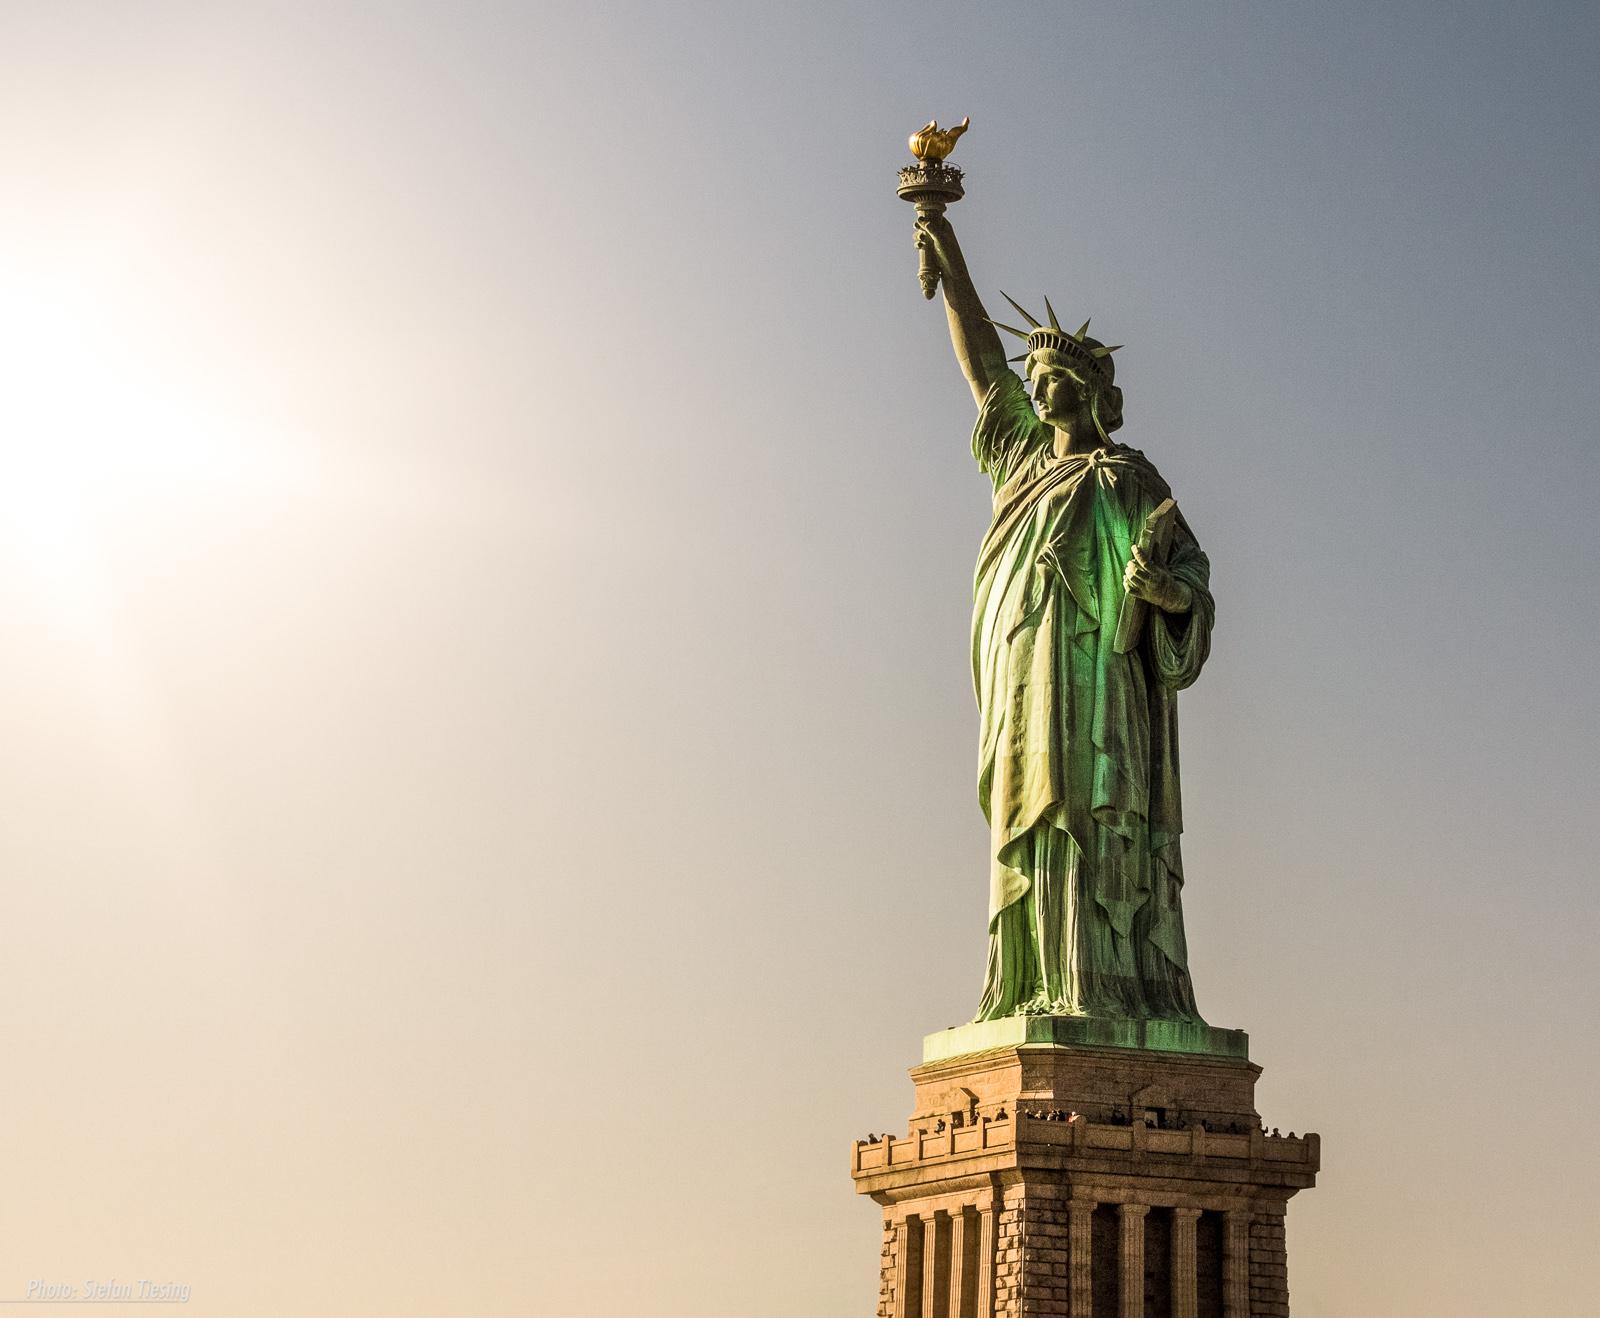 Burn, burn, burn (Statue of Liberty)